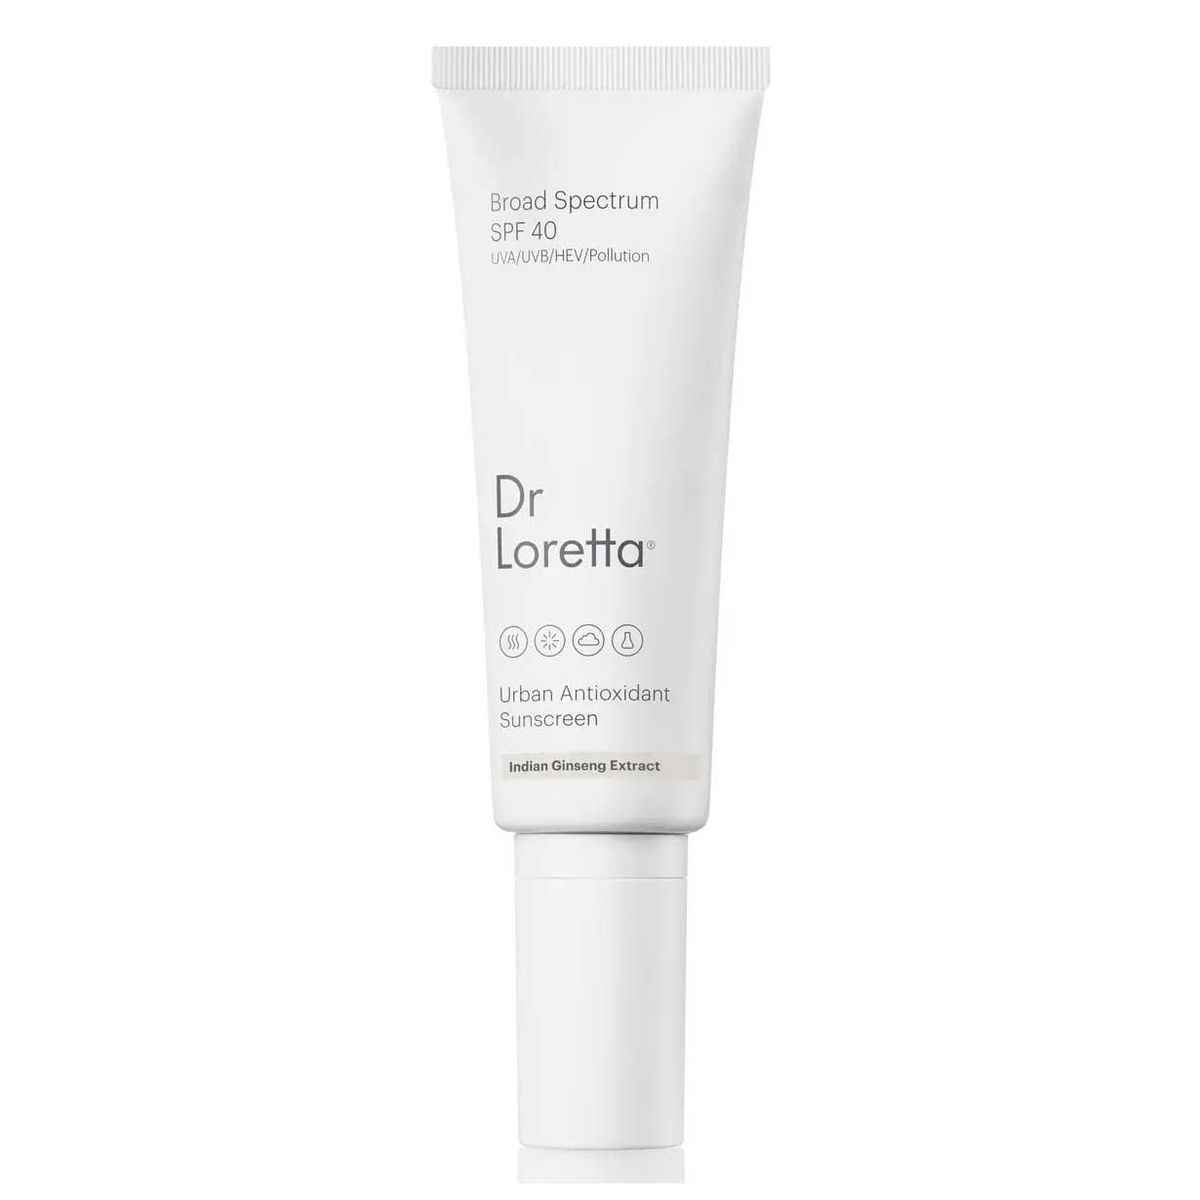 dr. loretta urban antioxidant sunscreen spf 40